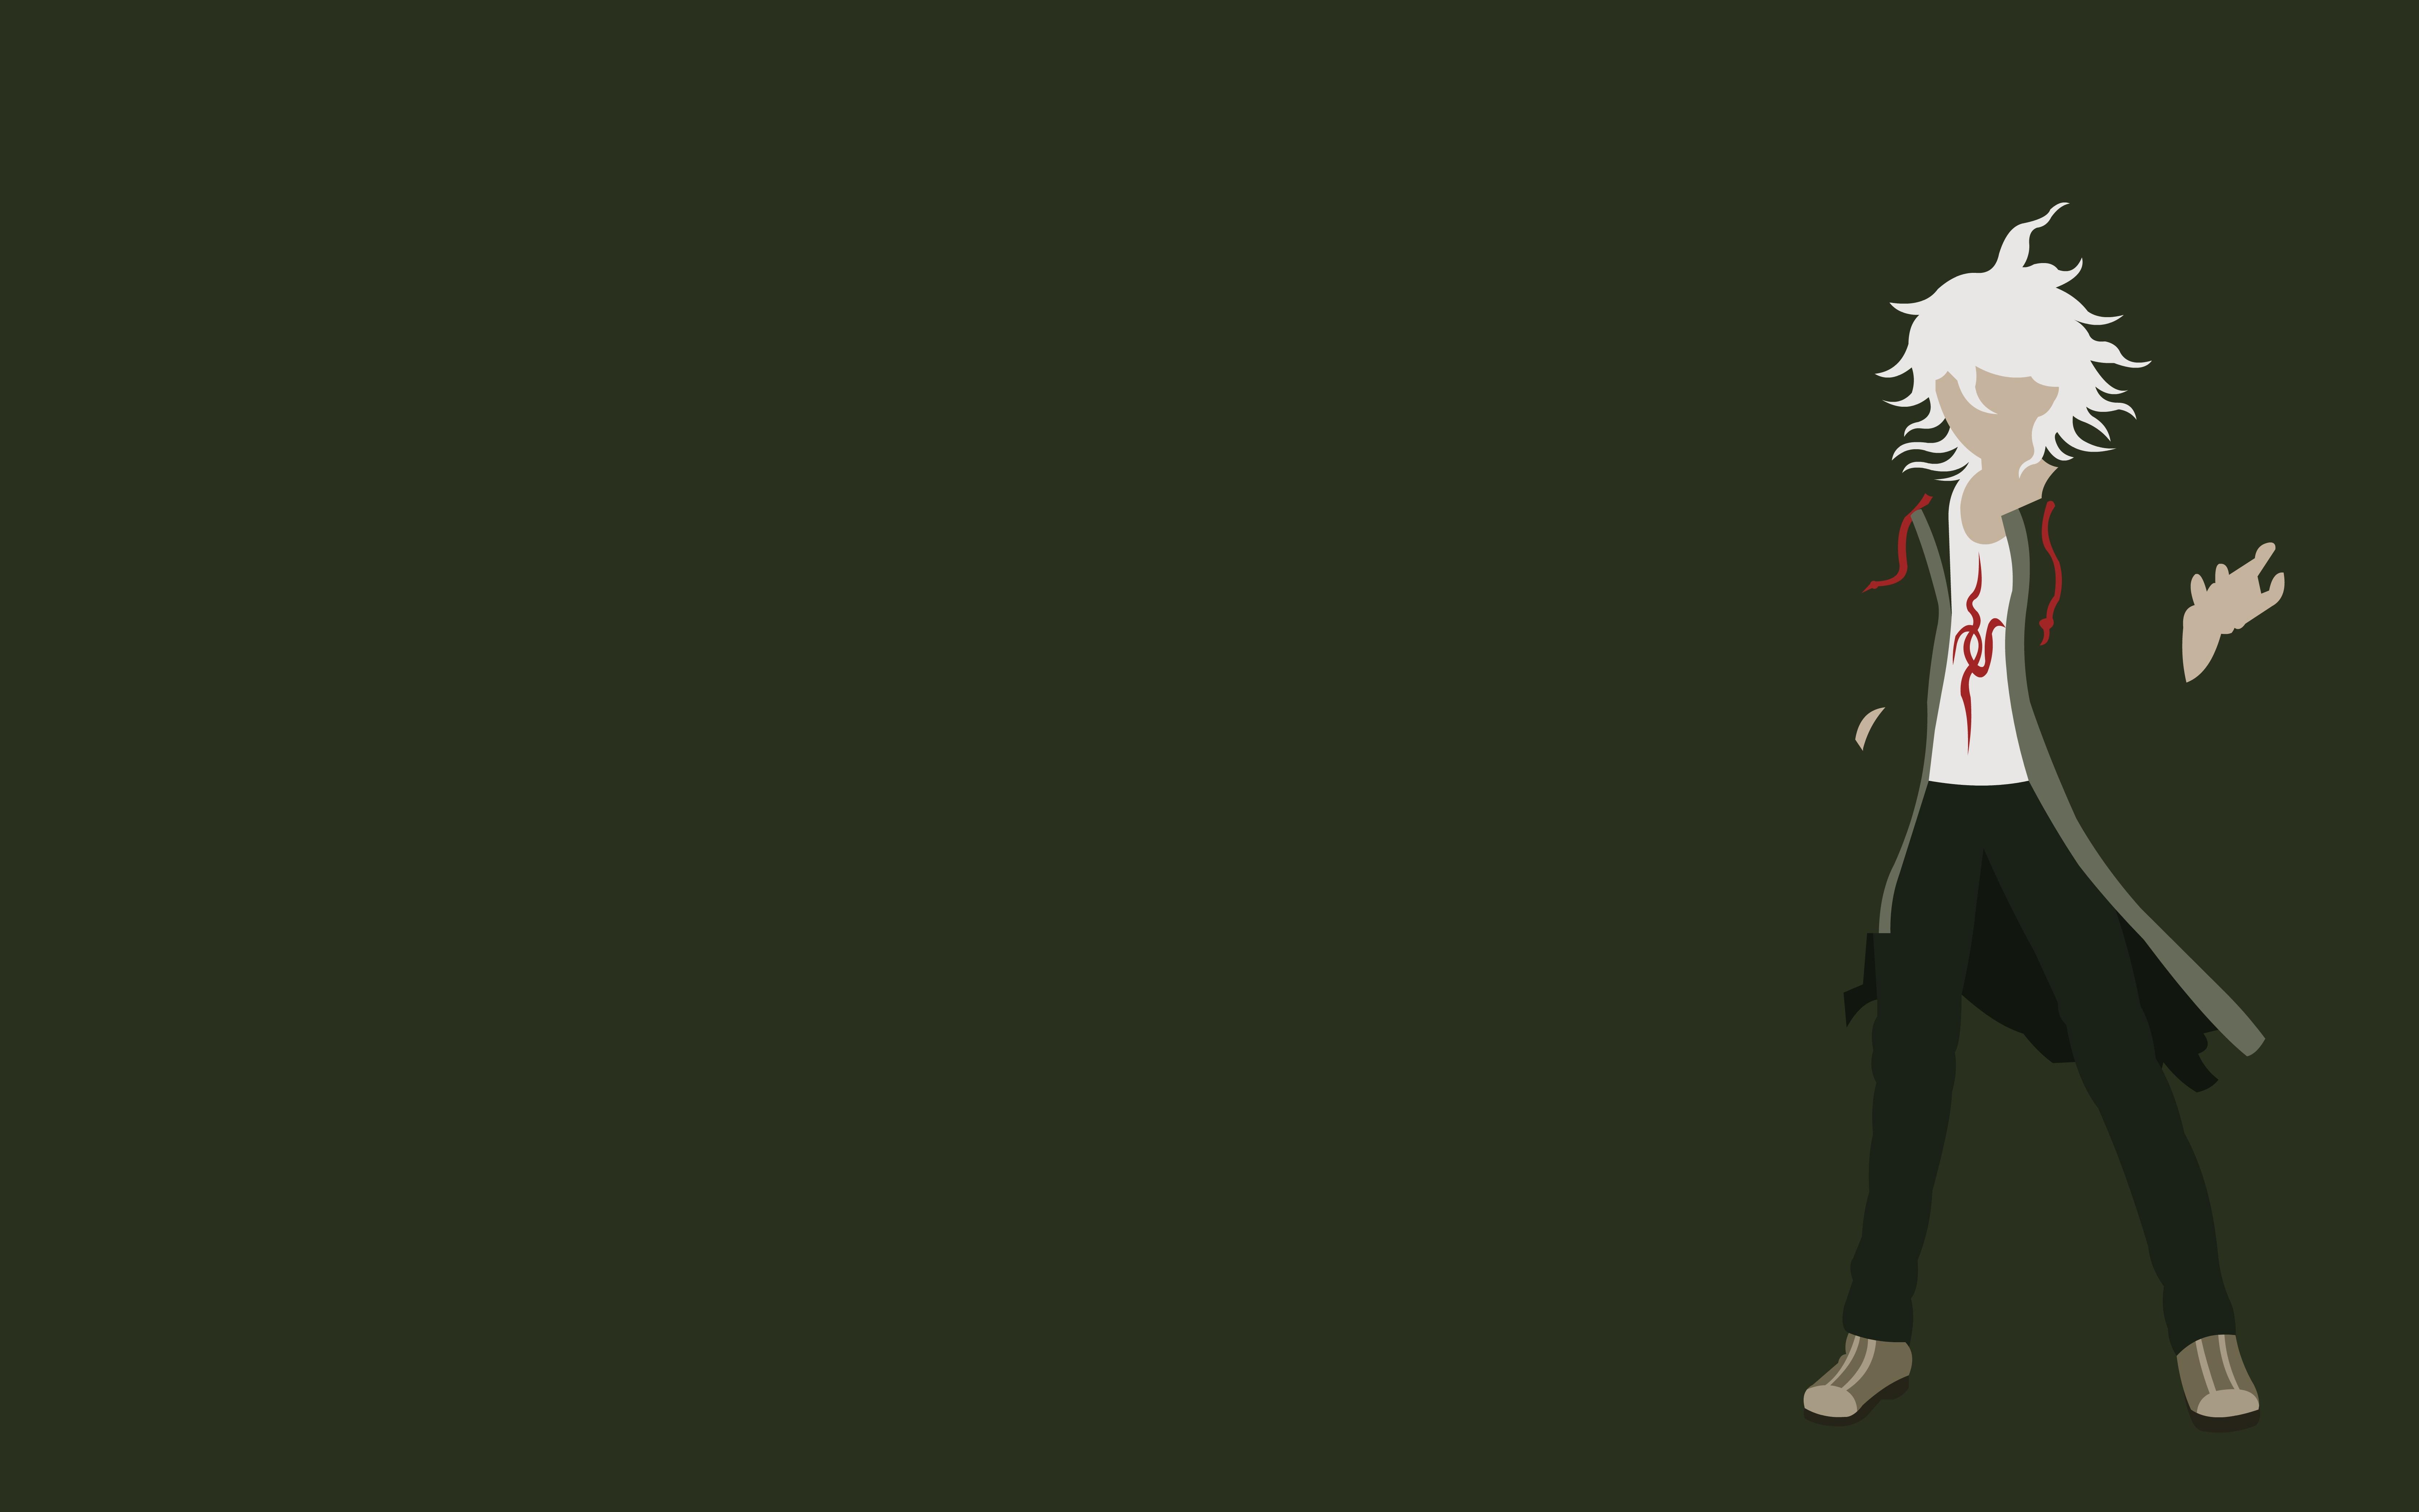 Nagito Komaeda 1 by dragonitearmy on DeviantArt